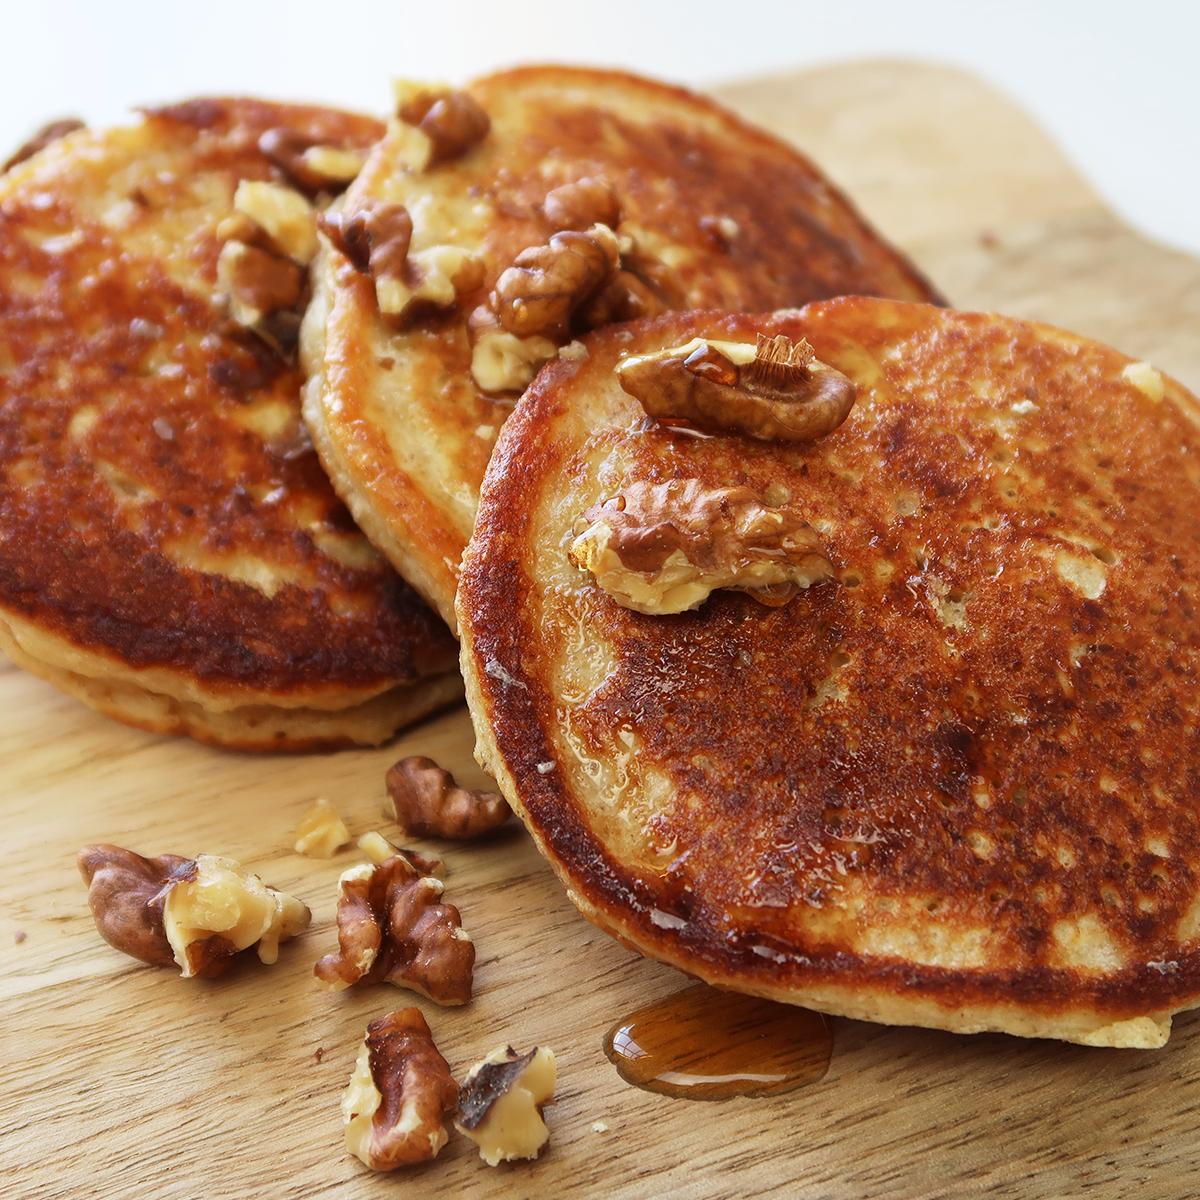 Pumpkin Spice Protein Pancakes van DoorMeal | Personal ...